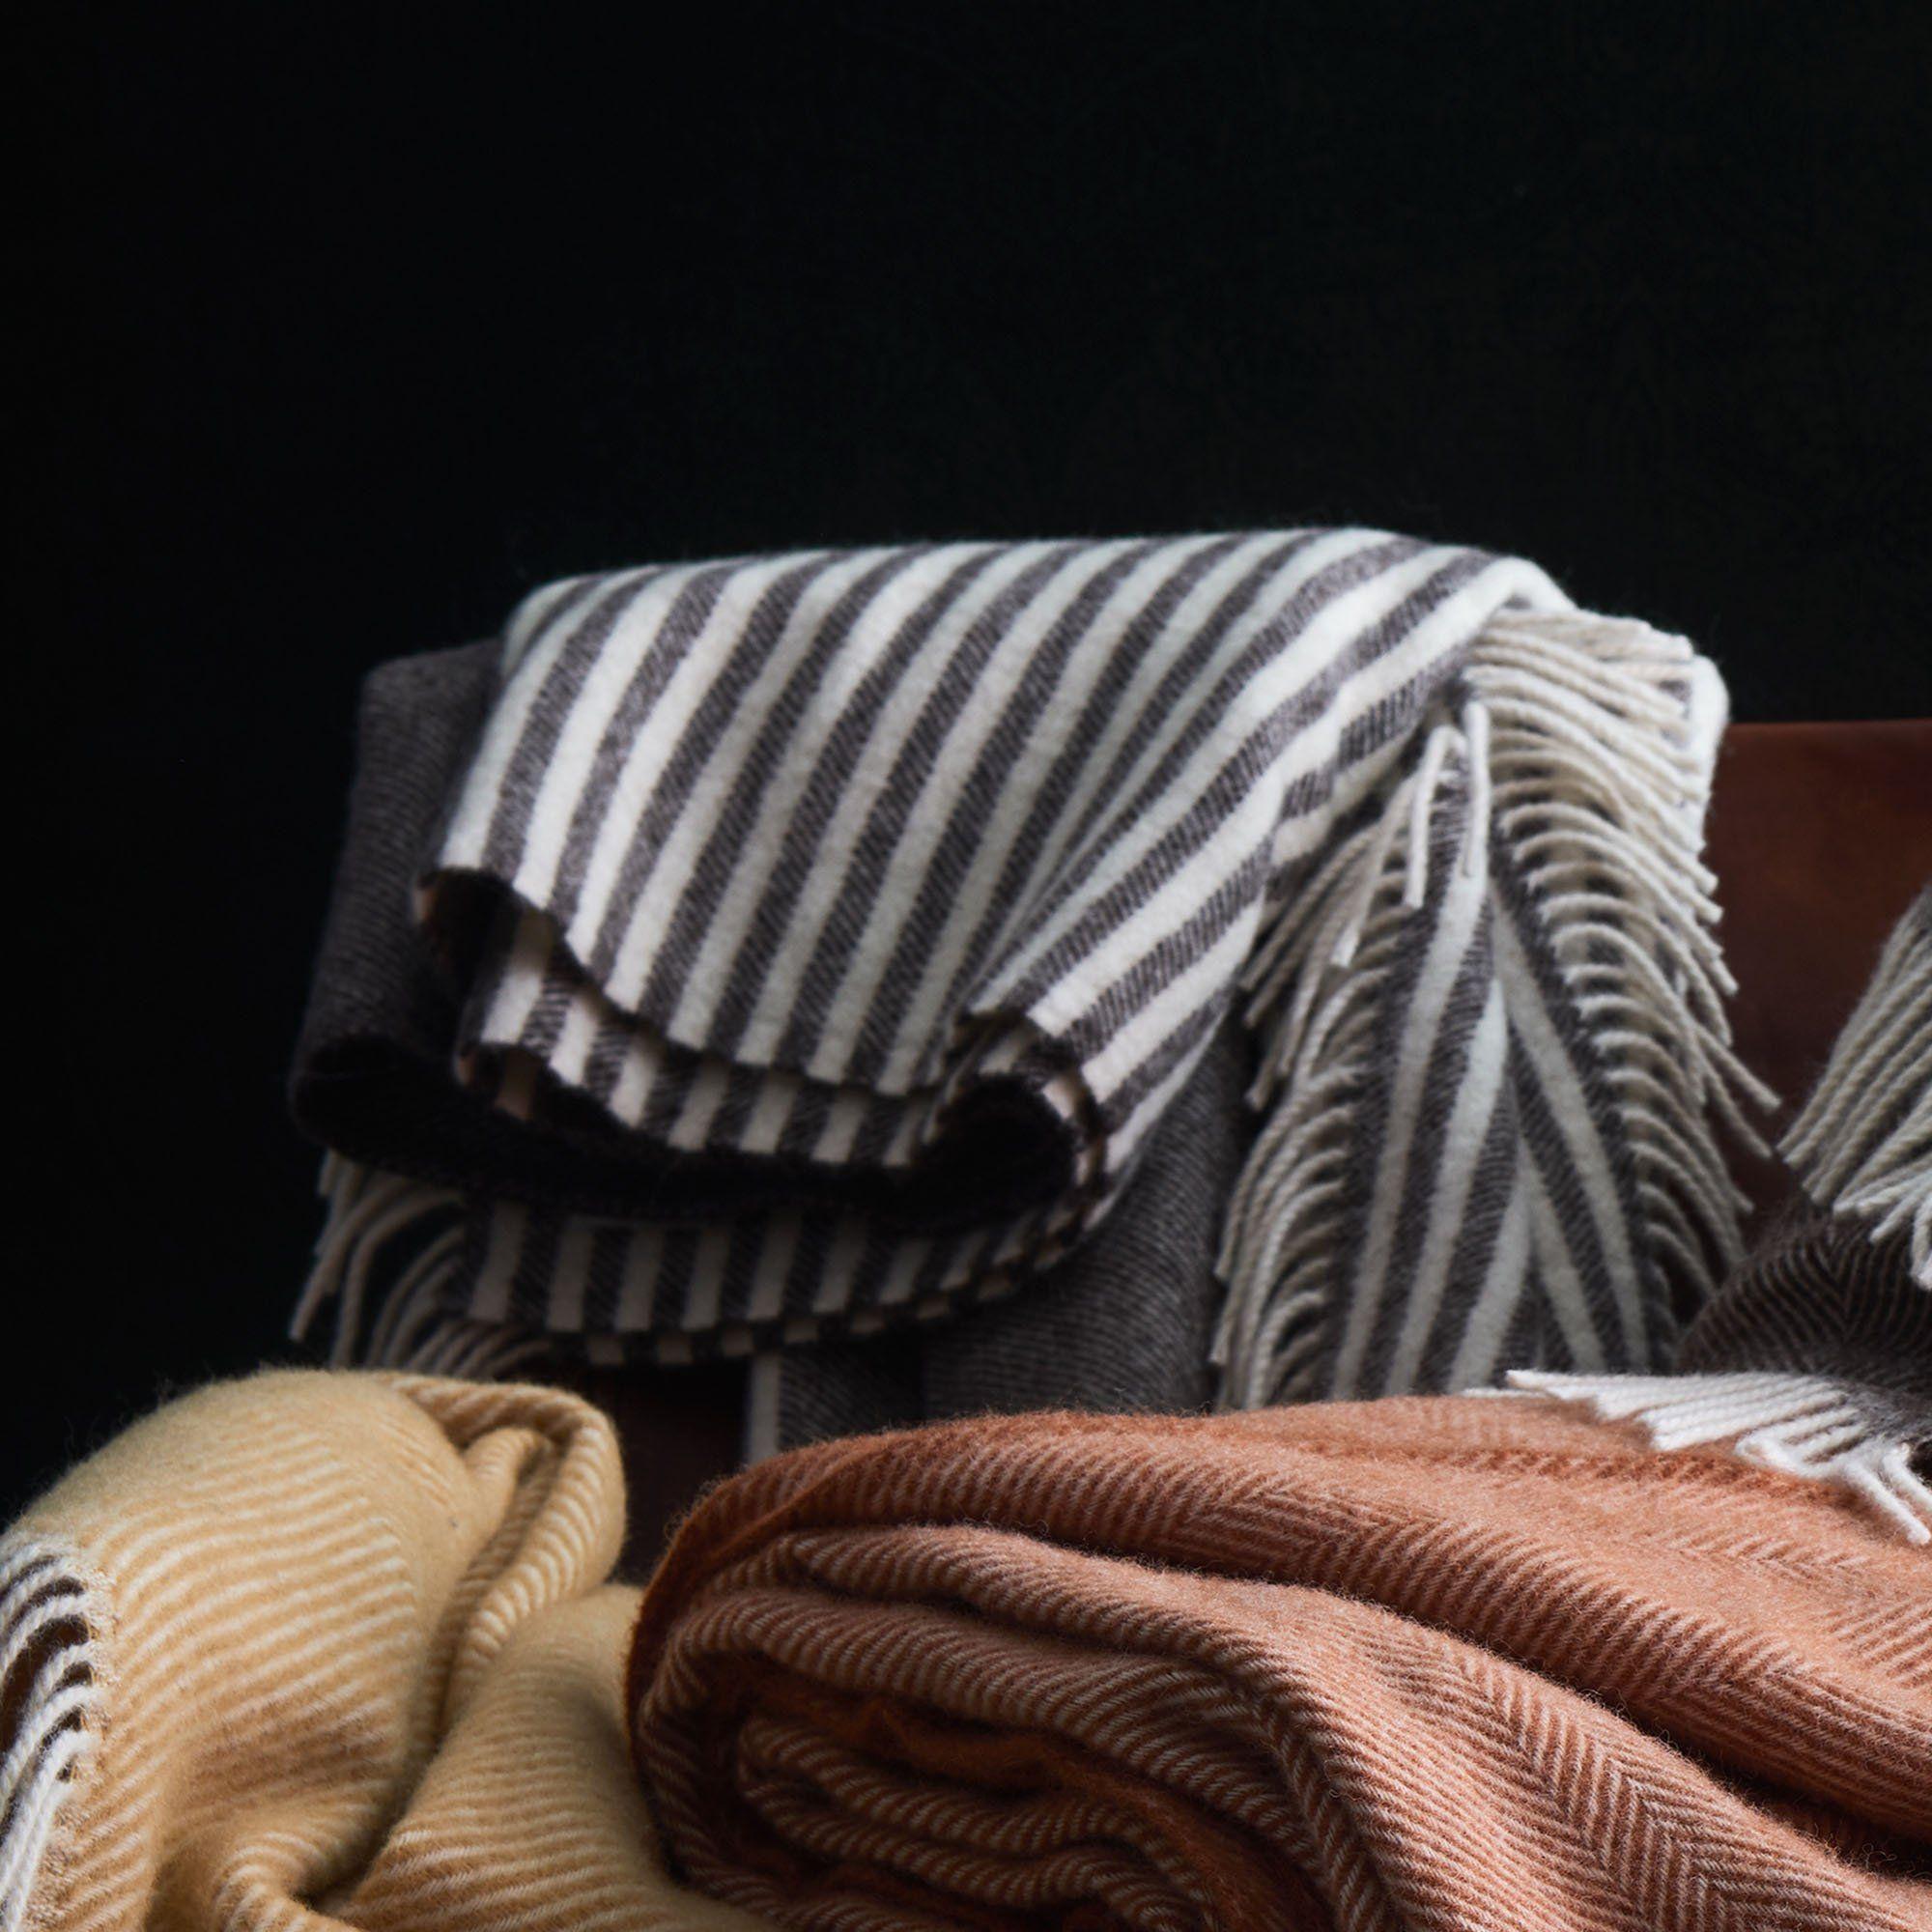 Wolldecke Visby Braun Creme 140x220 Cm Wolldecke Deckchen